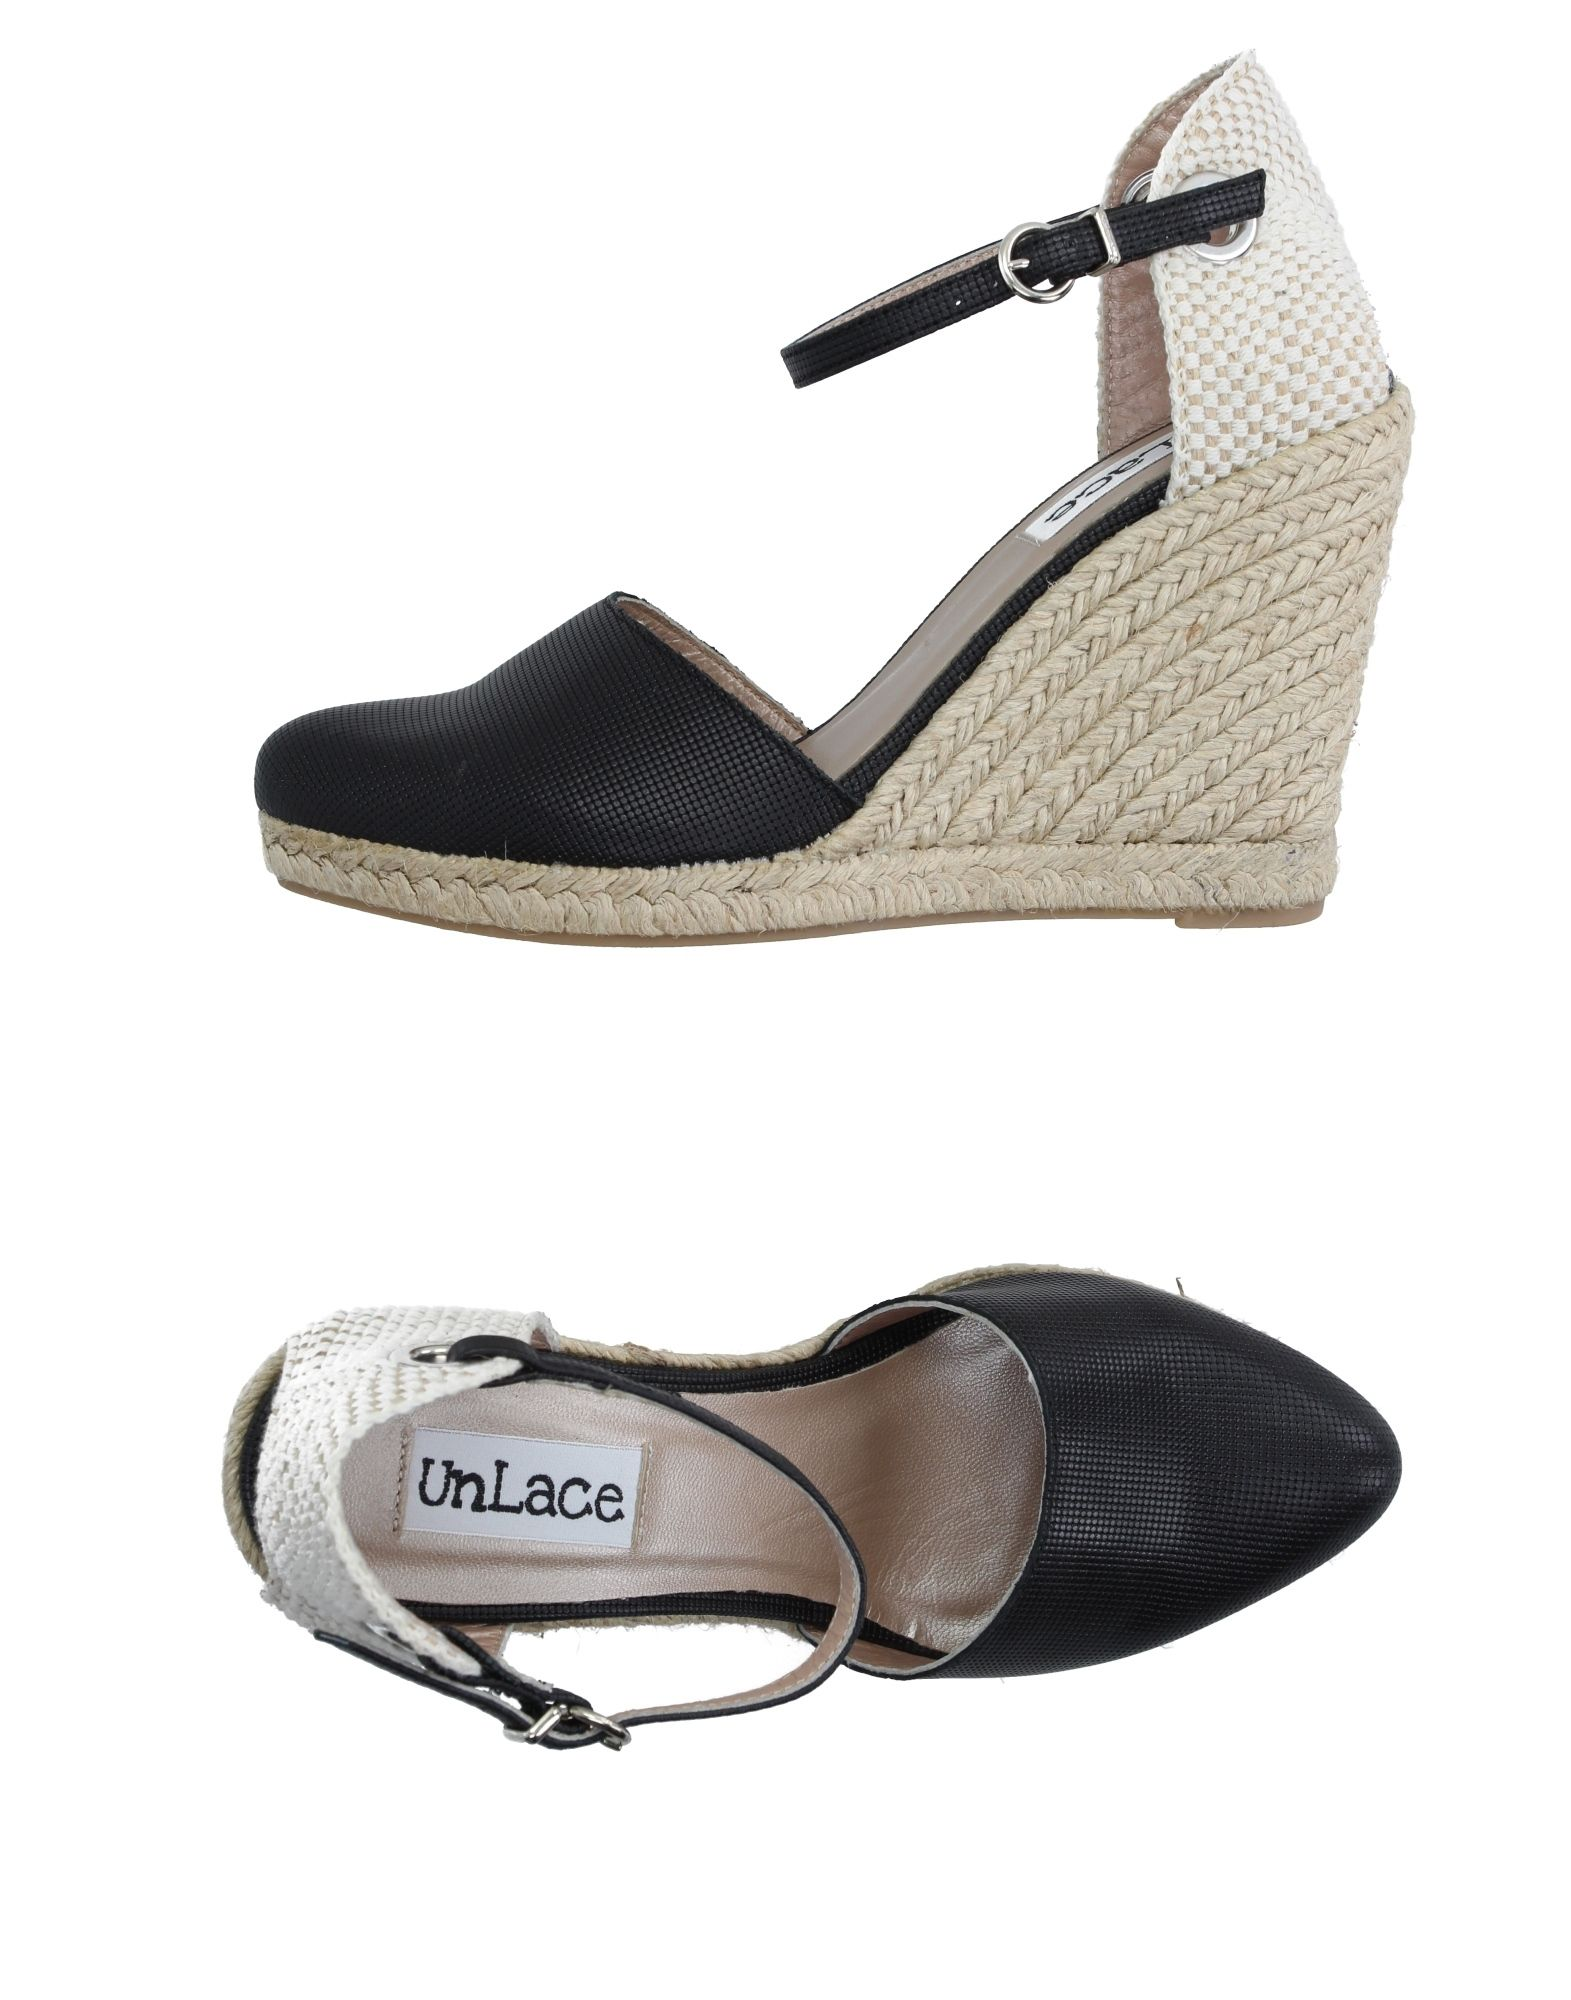 Unlace Espadrilles Damen  11132945NX Gute Qualität beliebte beliebte beliebte Schuhe 0f1748